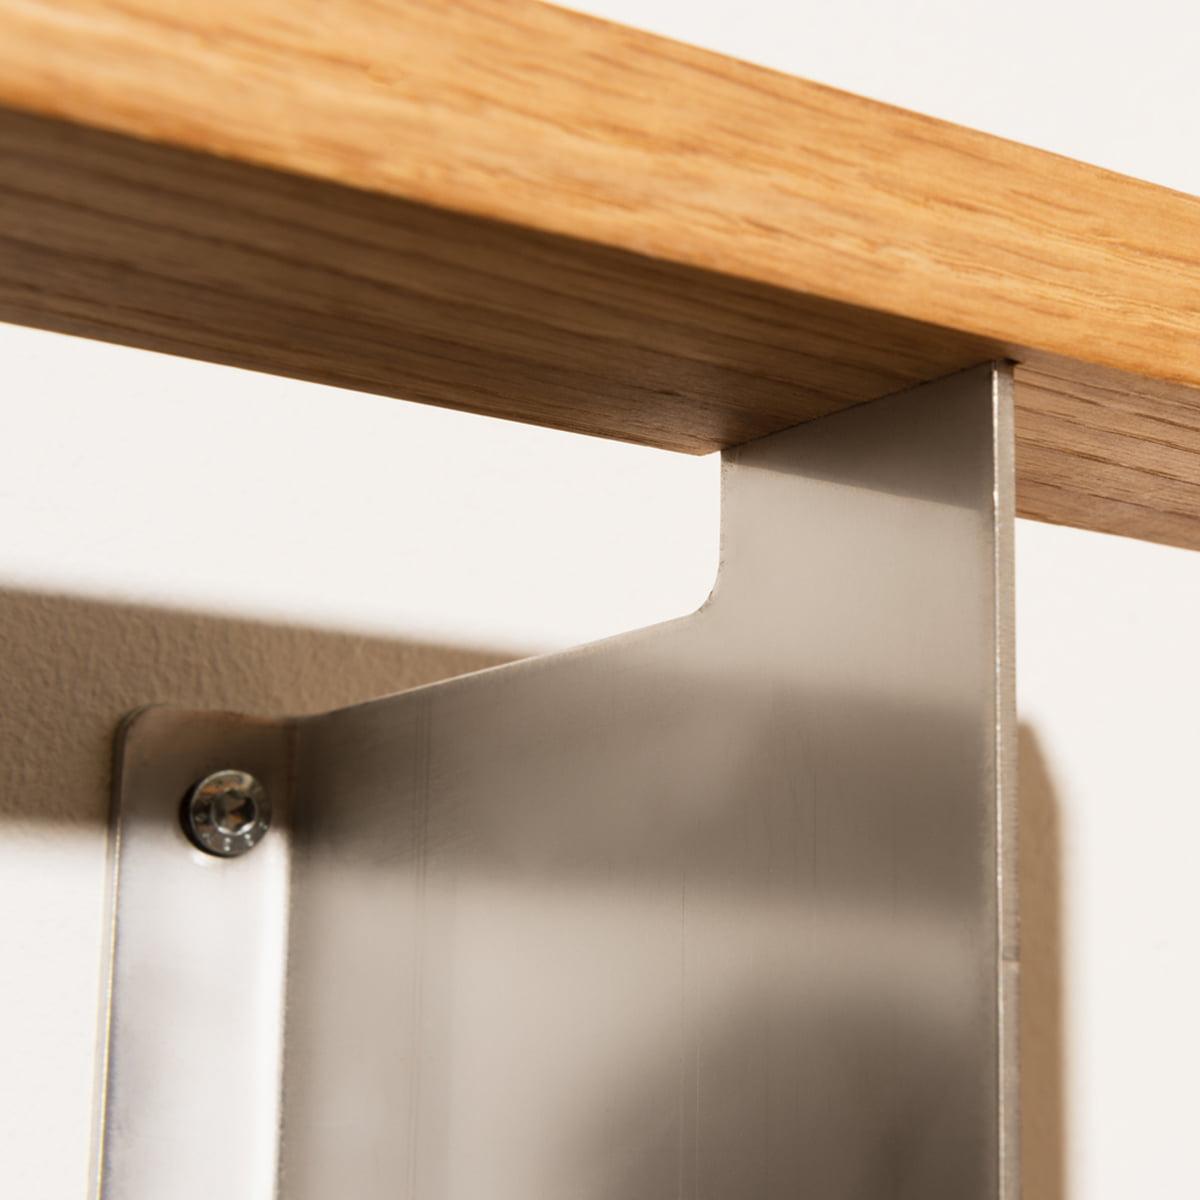 das kleine b shelf in the interior design shop. Black Bedroom Furniture Sets. Home Design Ideas